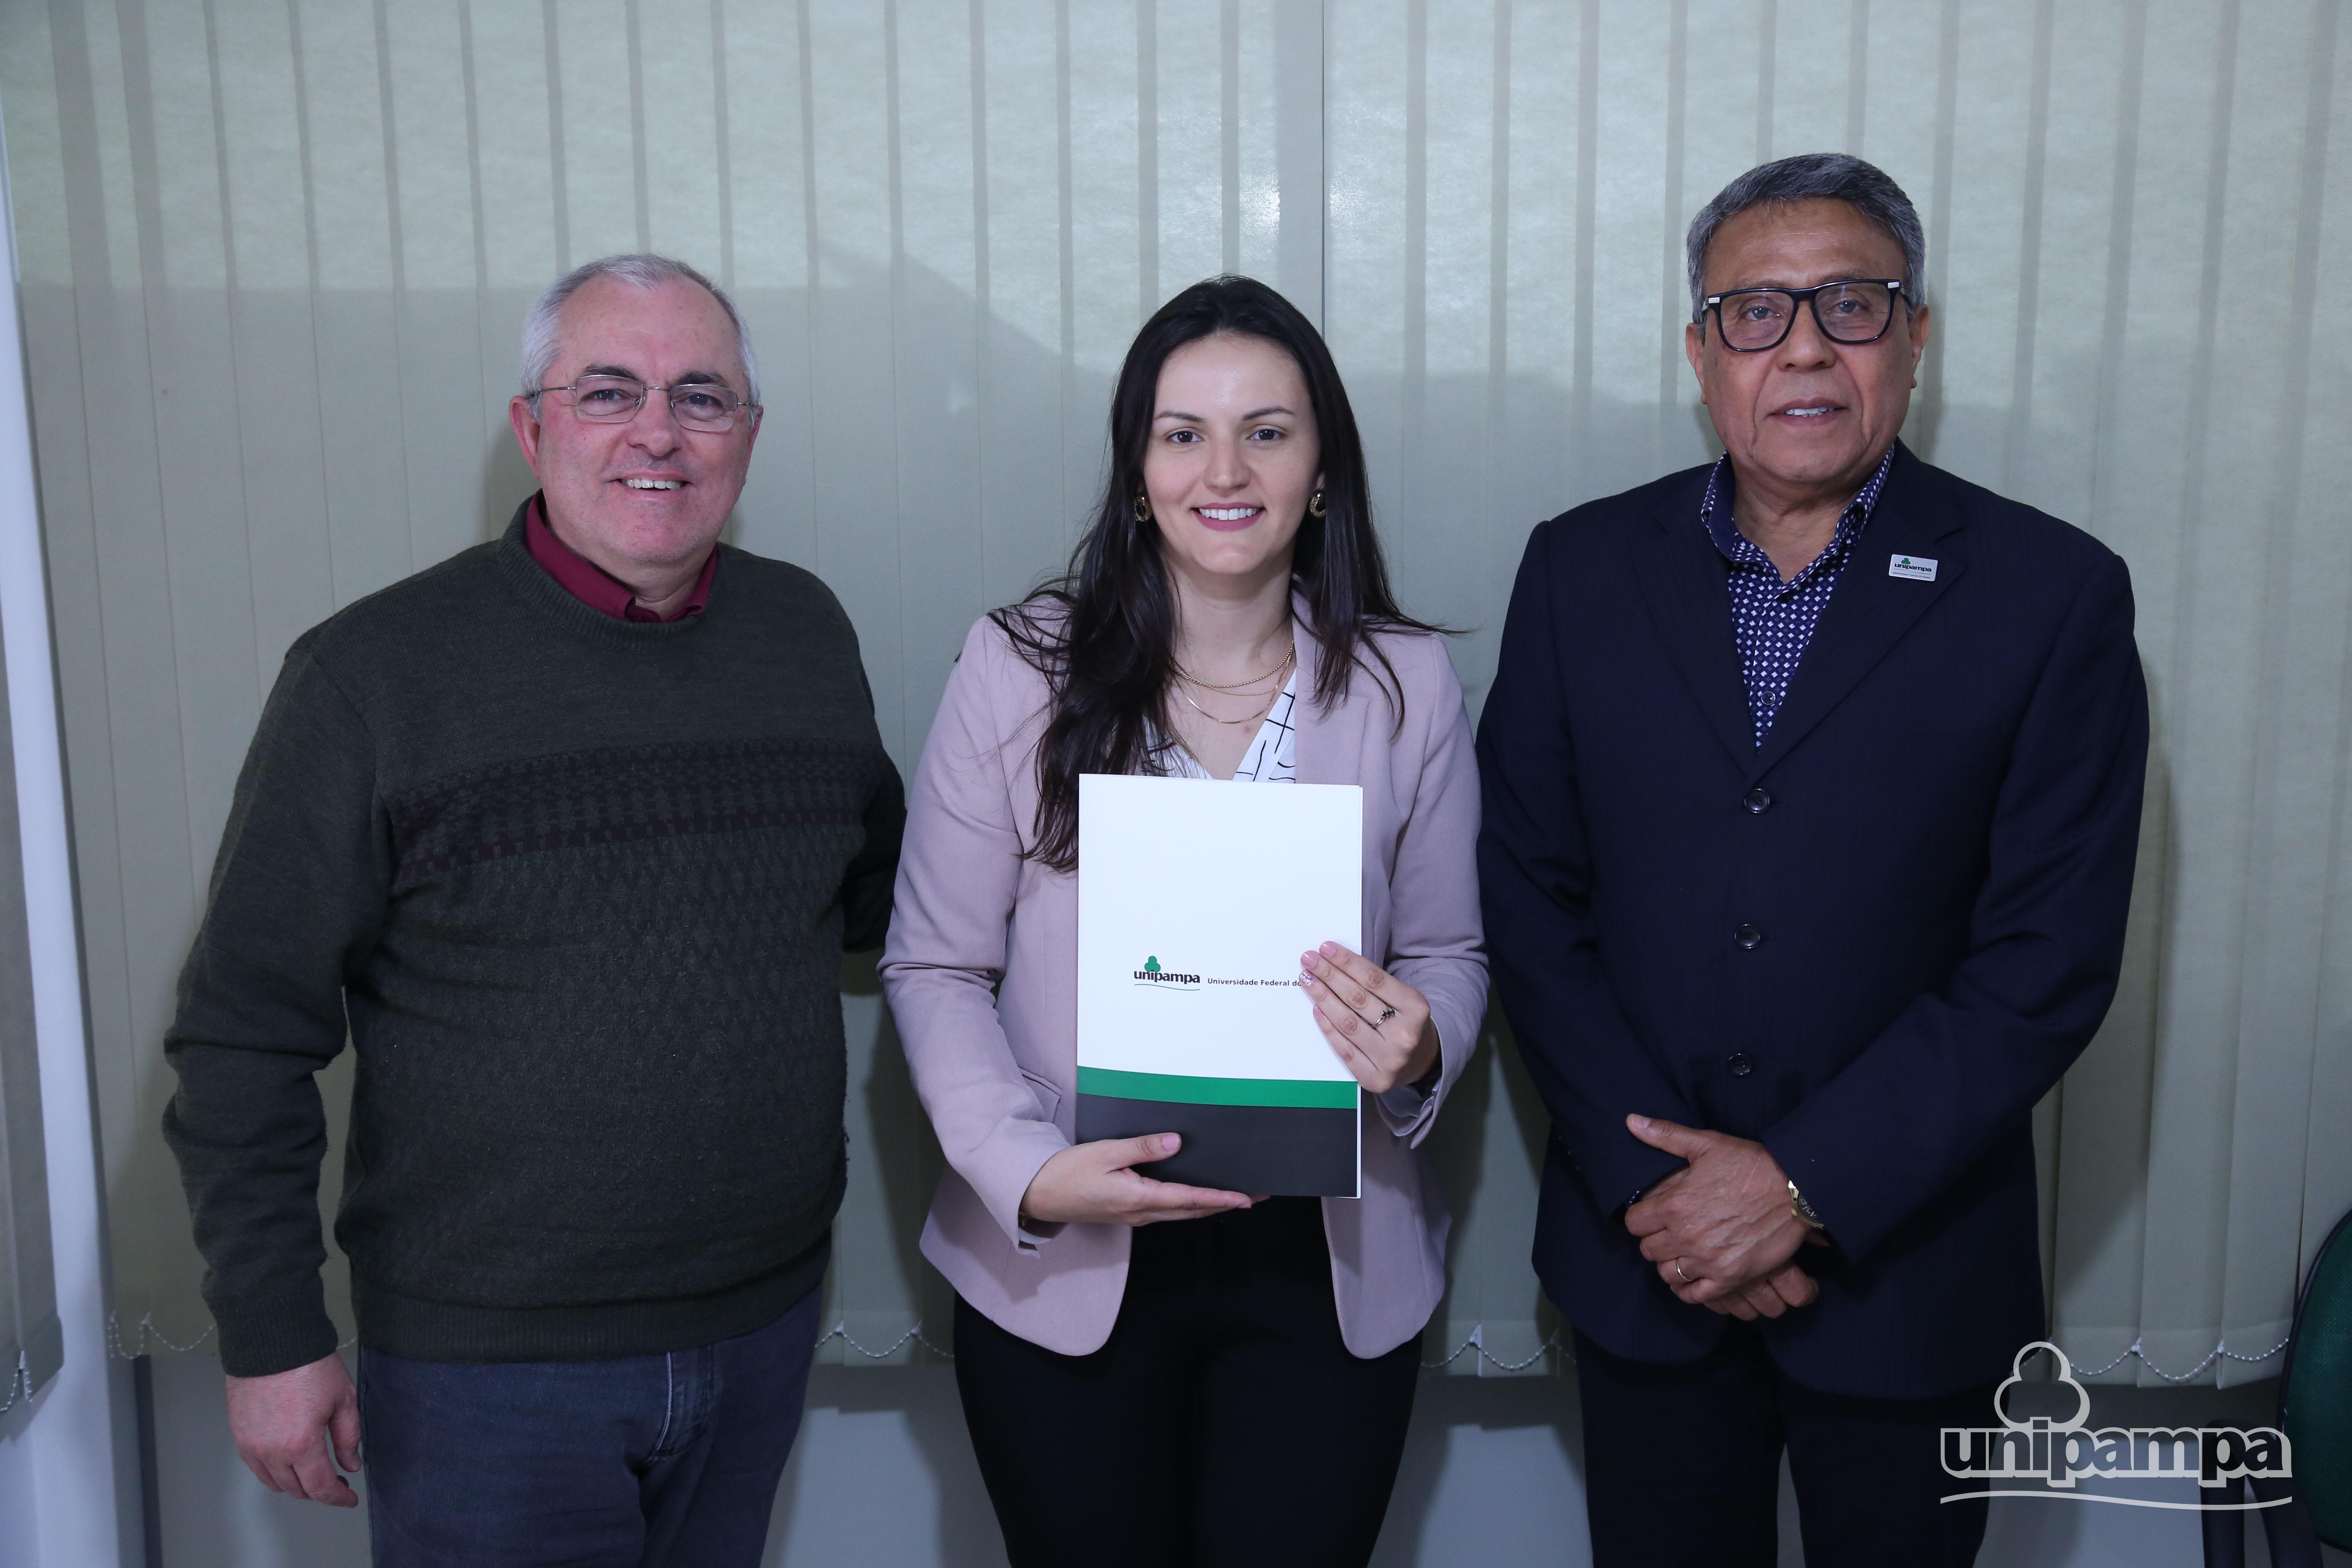 Fernanda Volpato Chiapinoto - Foto: Ronaldo Estevam/Unipampa